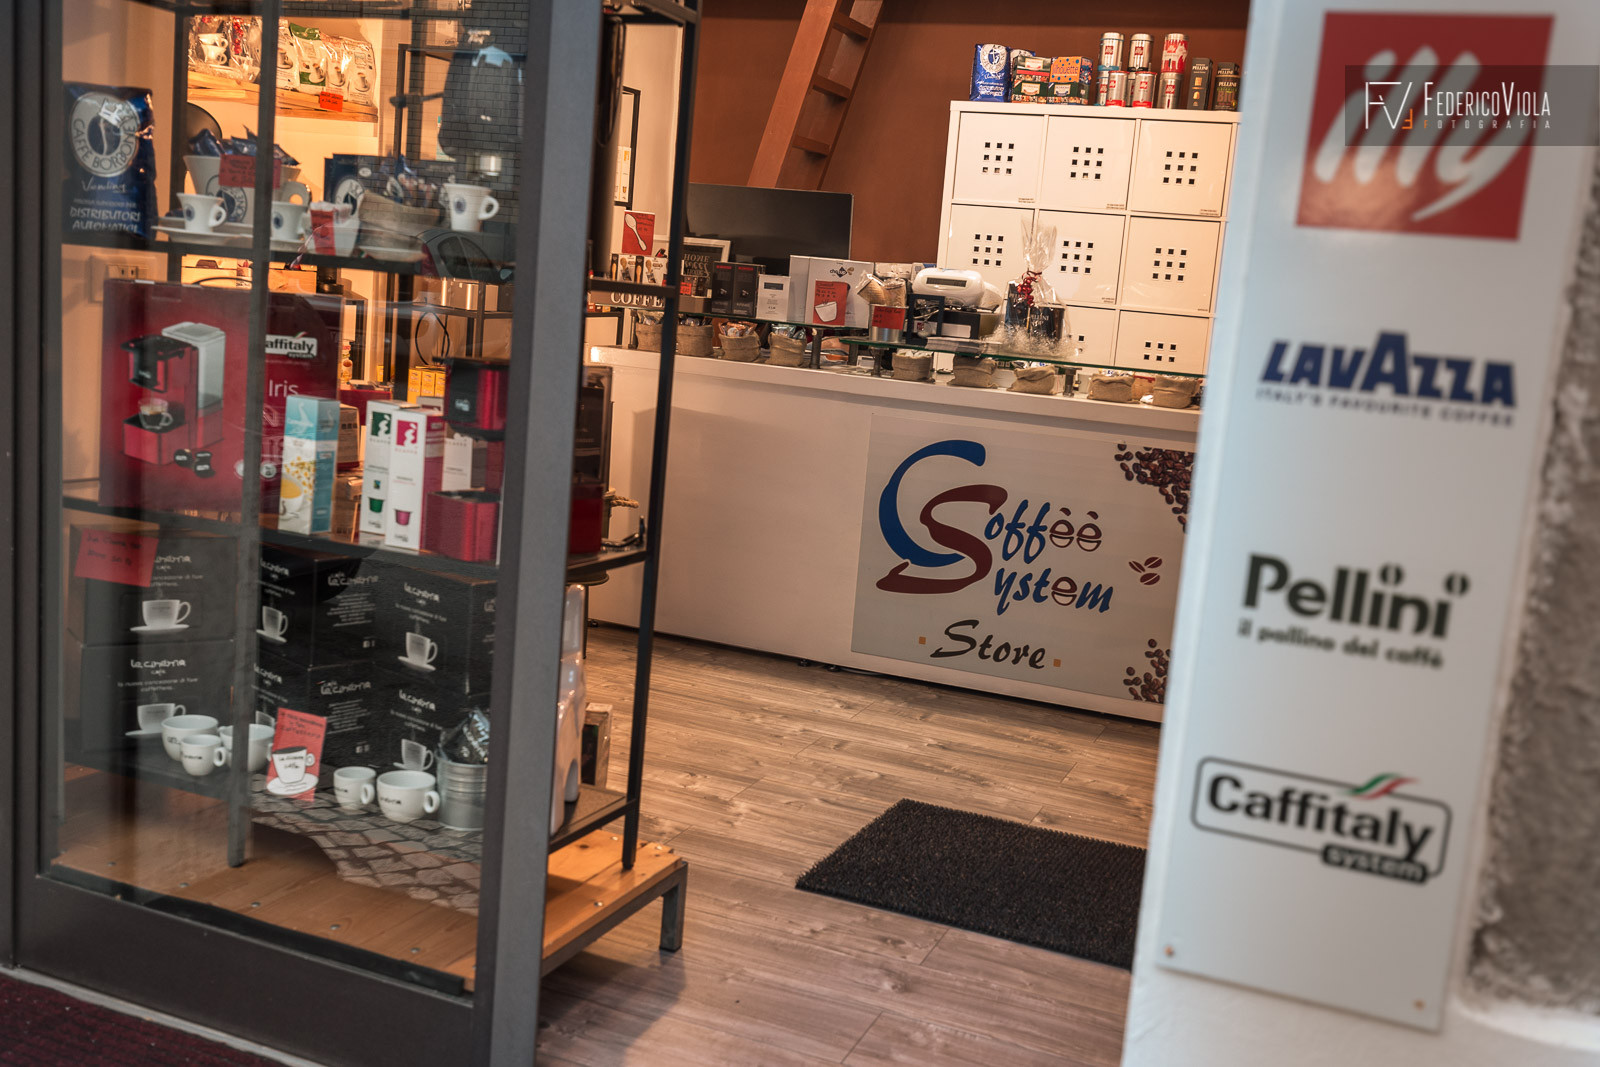 Foto-negozio-Coffee-System-Terracina-Federico-Viola-Fotografia